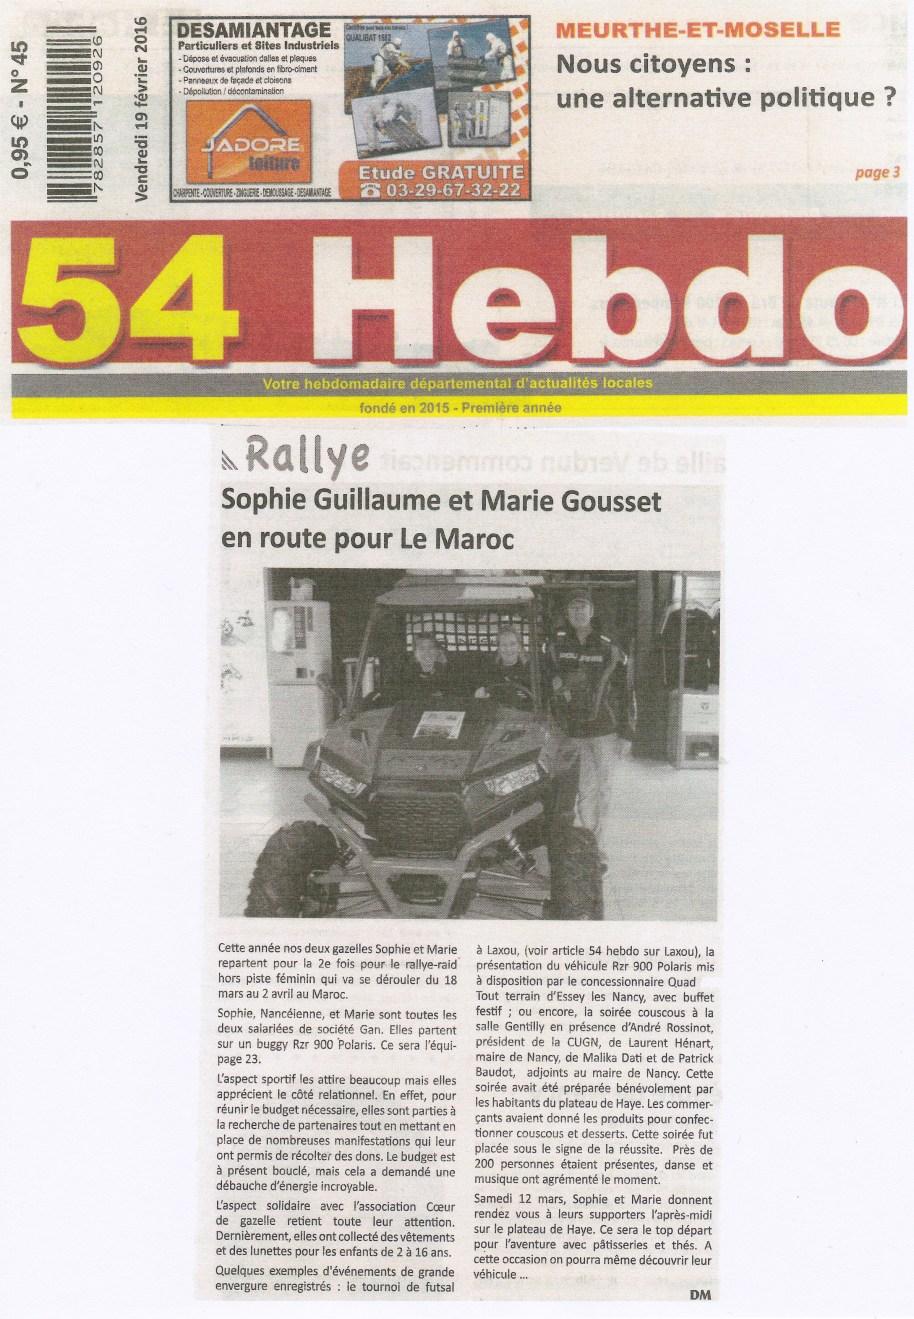 2016 02 19 Article 54HEBDO_Journal Papier_Rallye